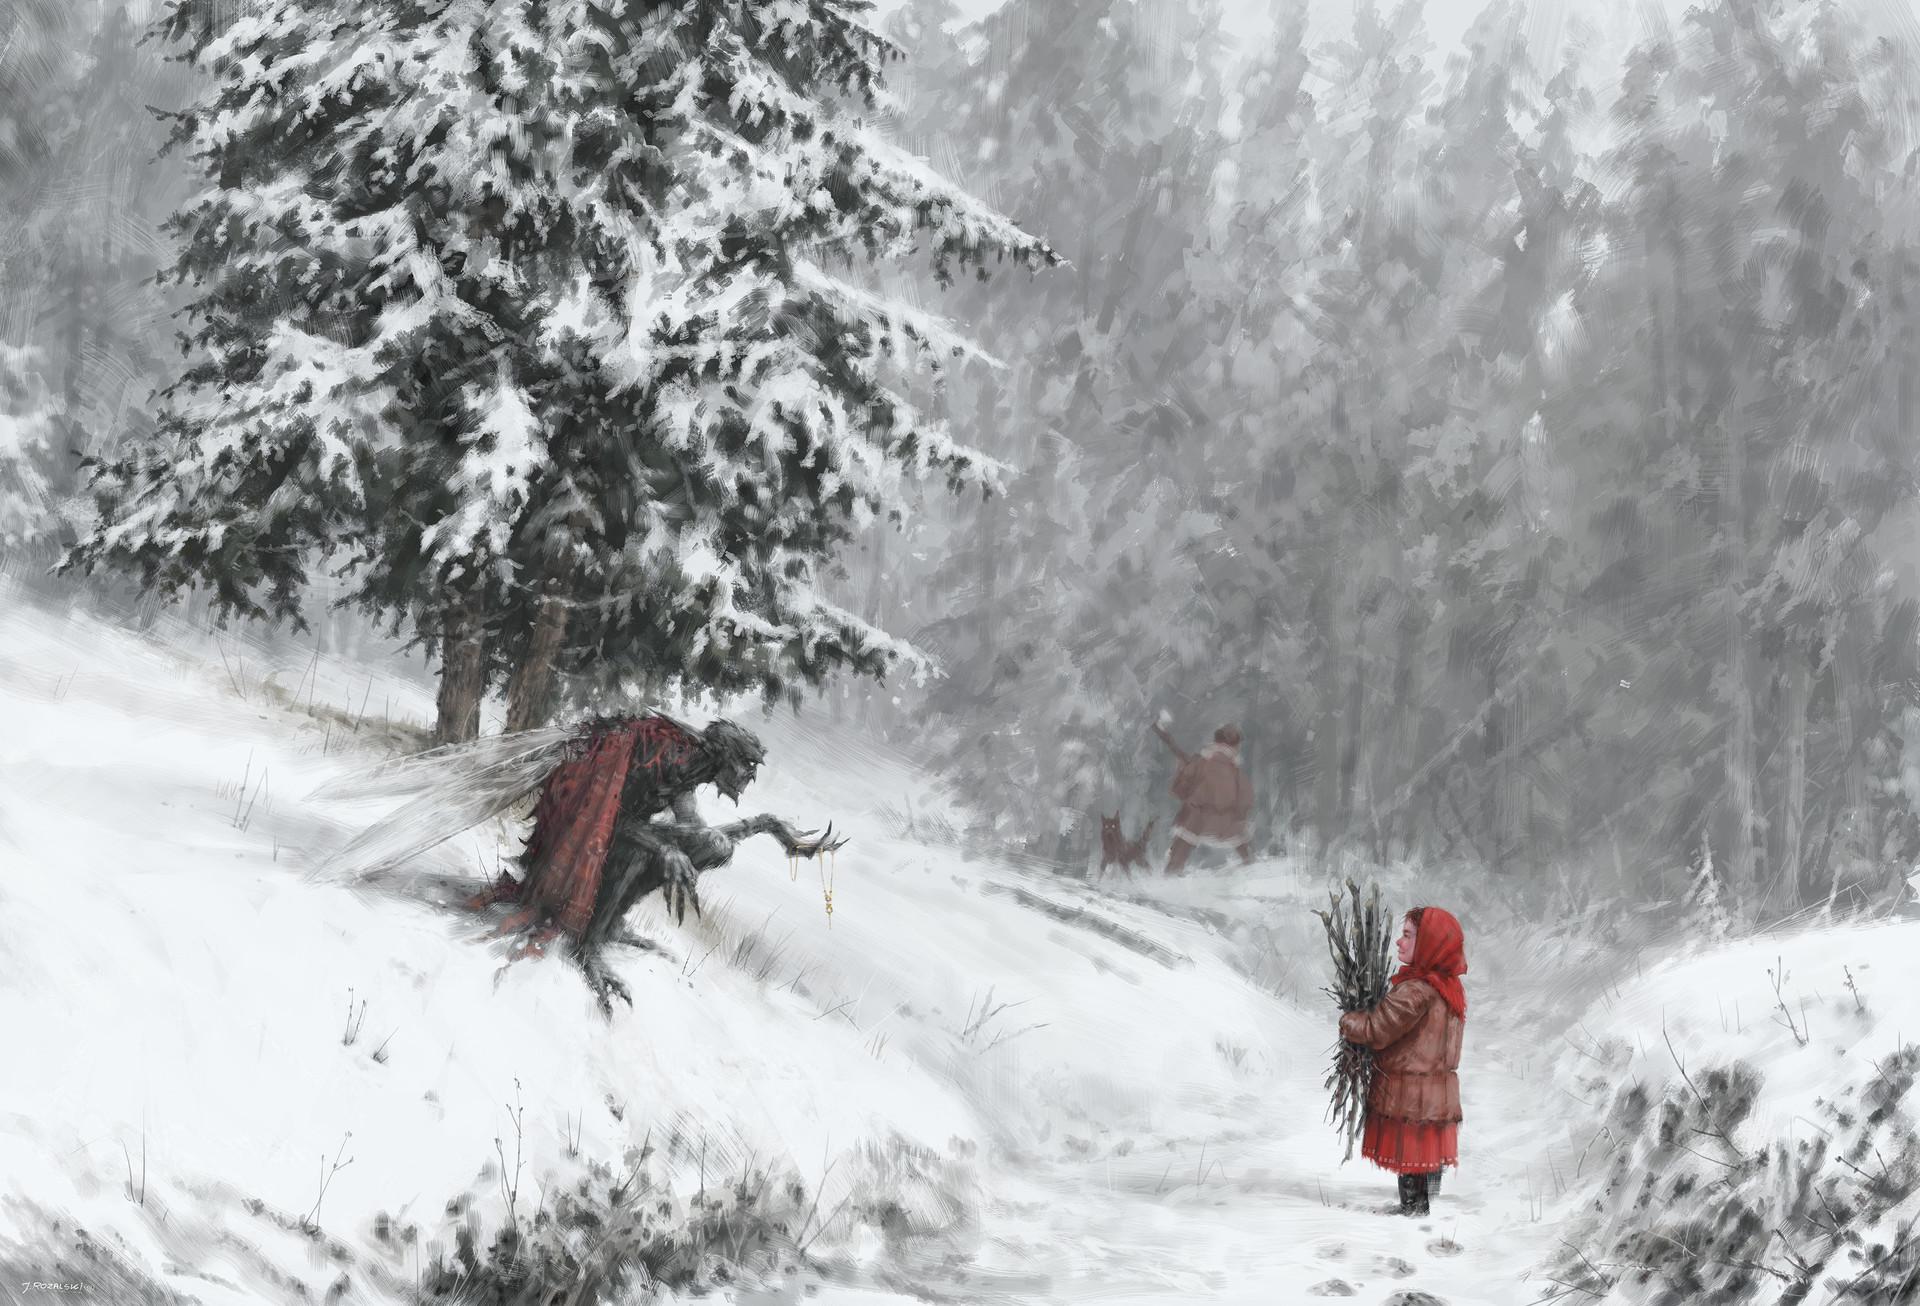 Jakub rozalski drak fairy returns